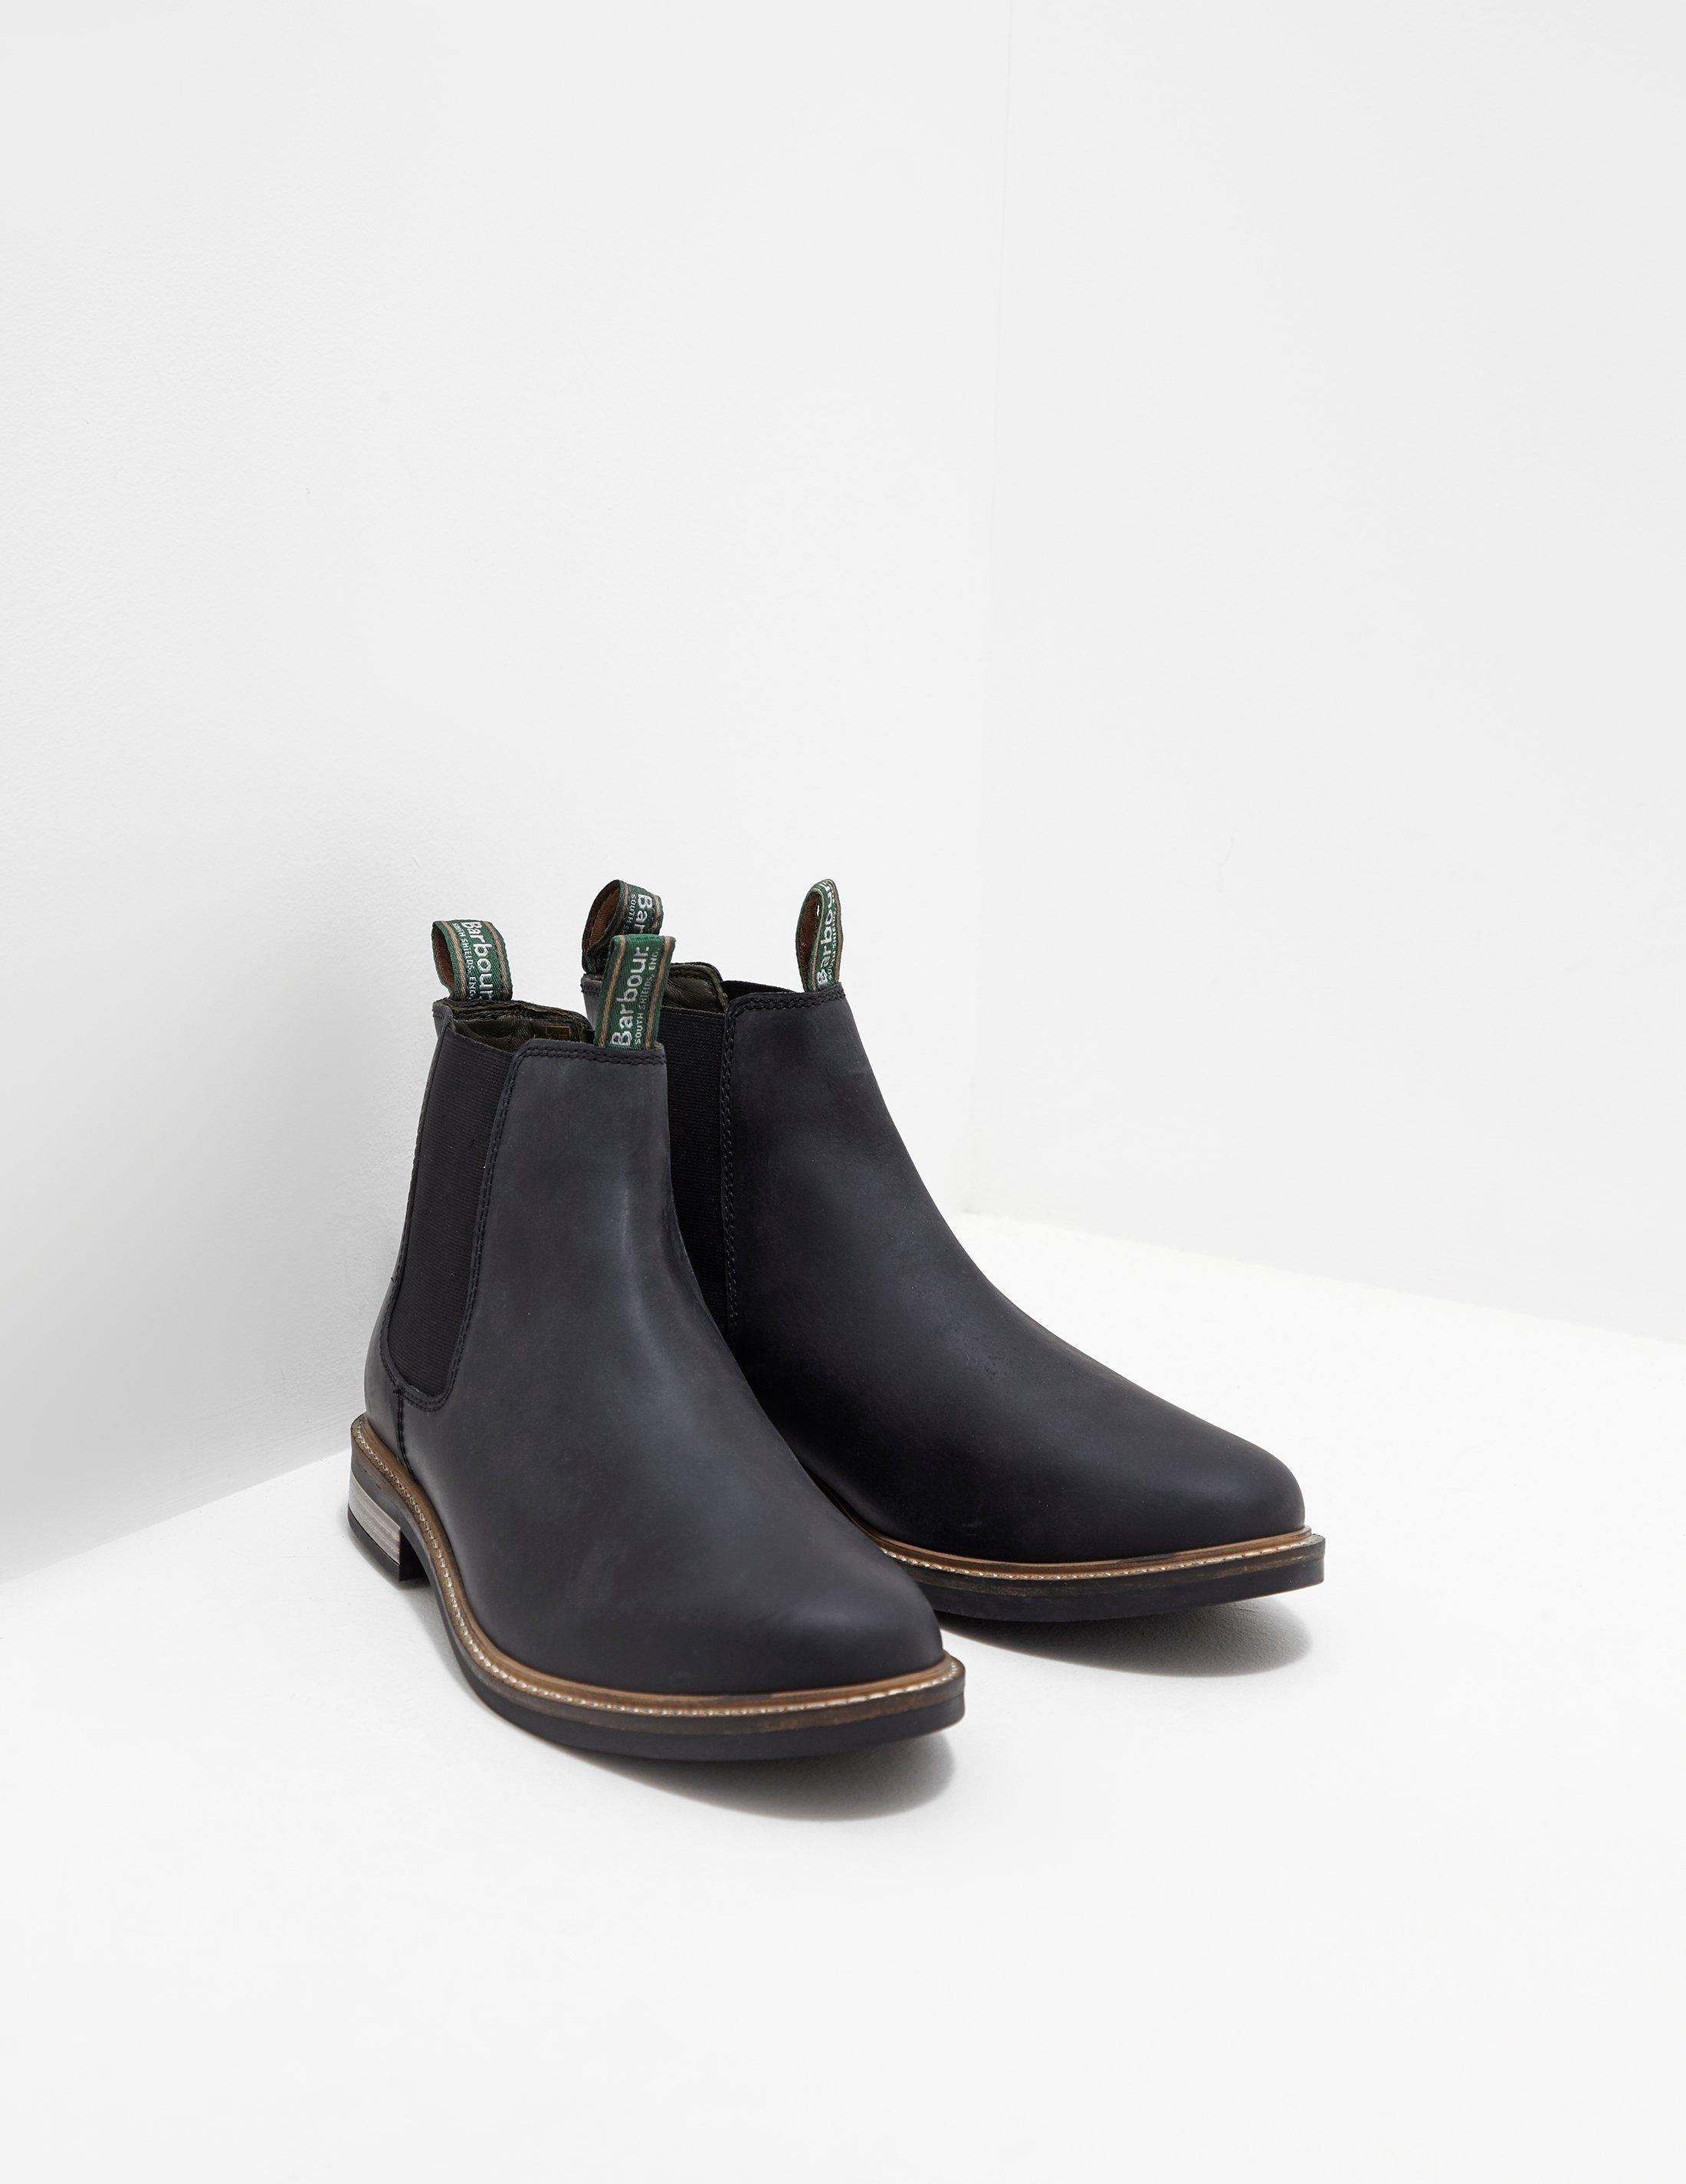 dbaadd249f5 Lyst - Barbour Farsley Boot Black in Black for Men